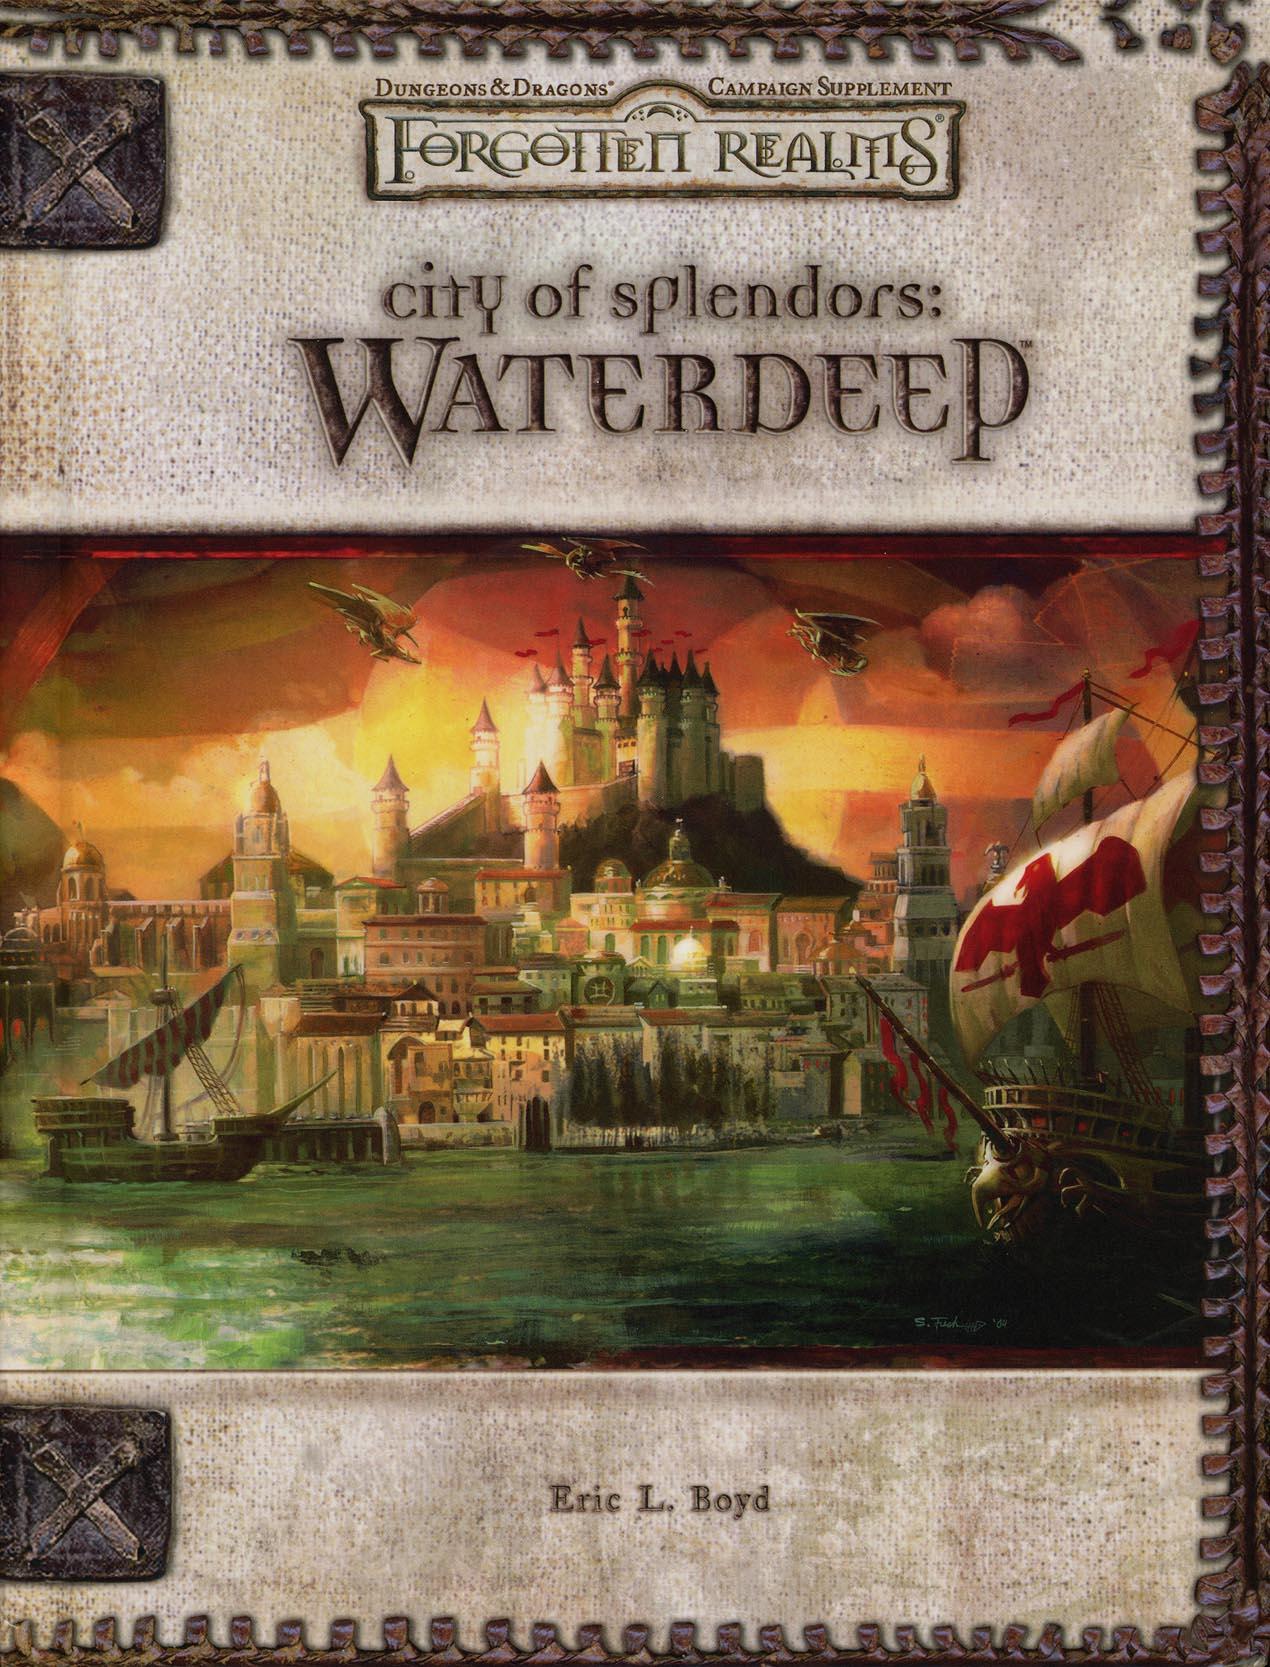 City of Splendors: Waterdeep